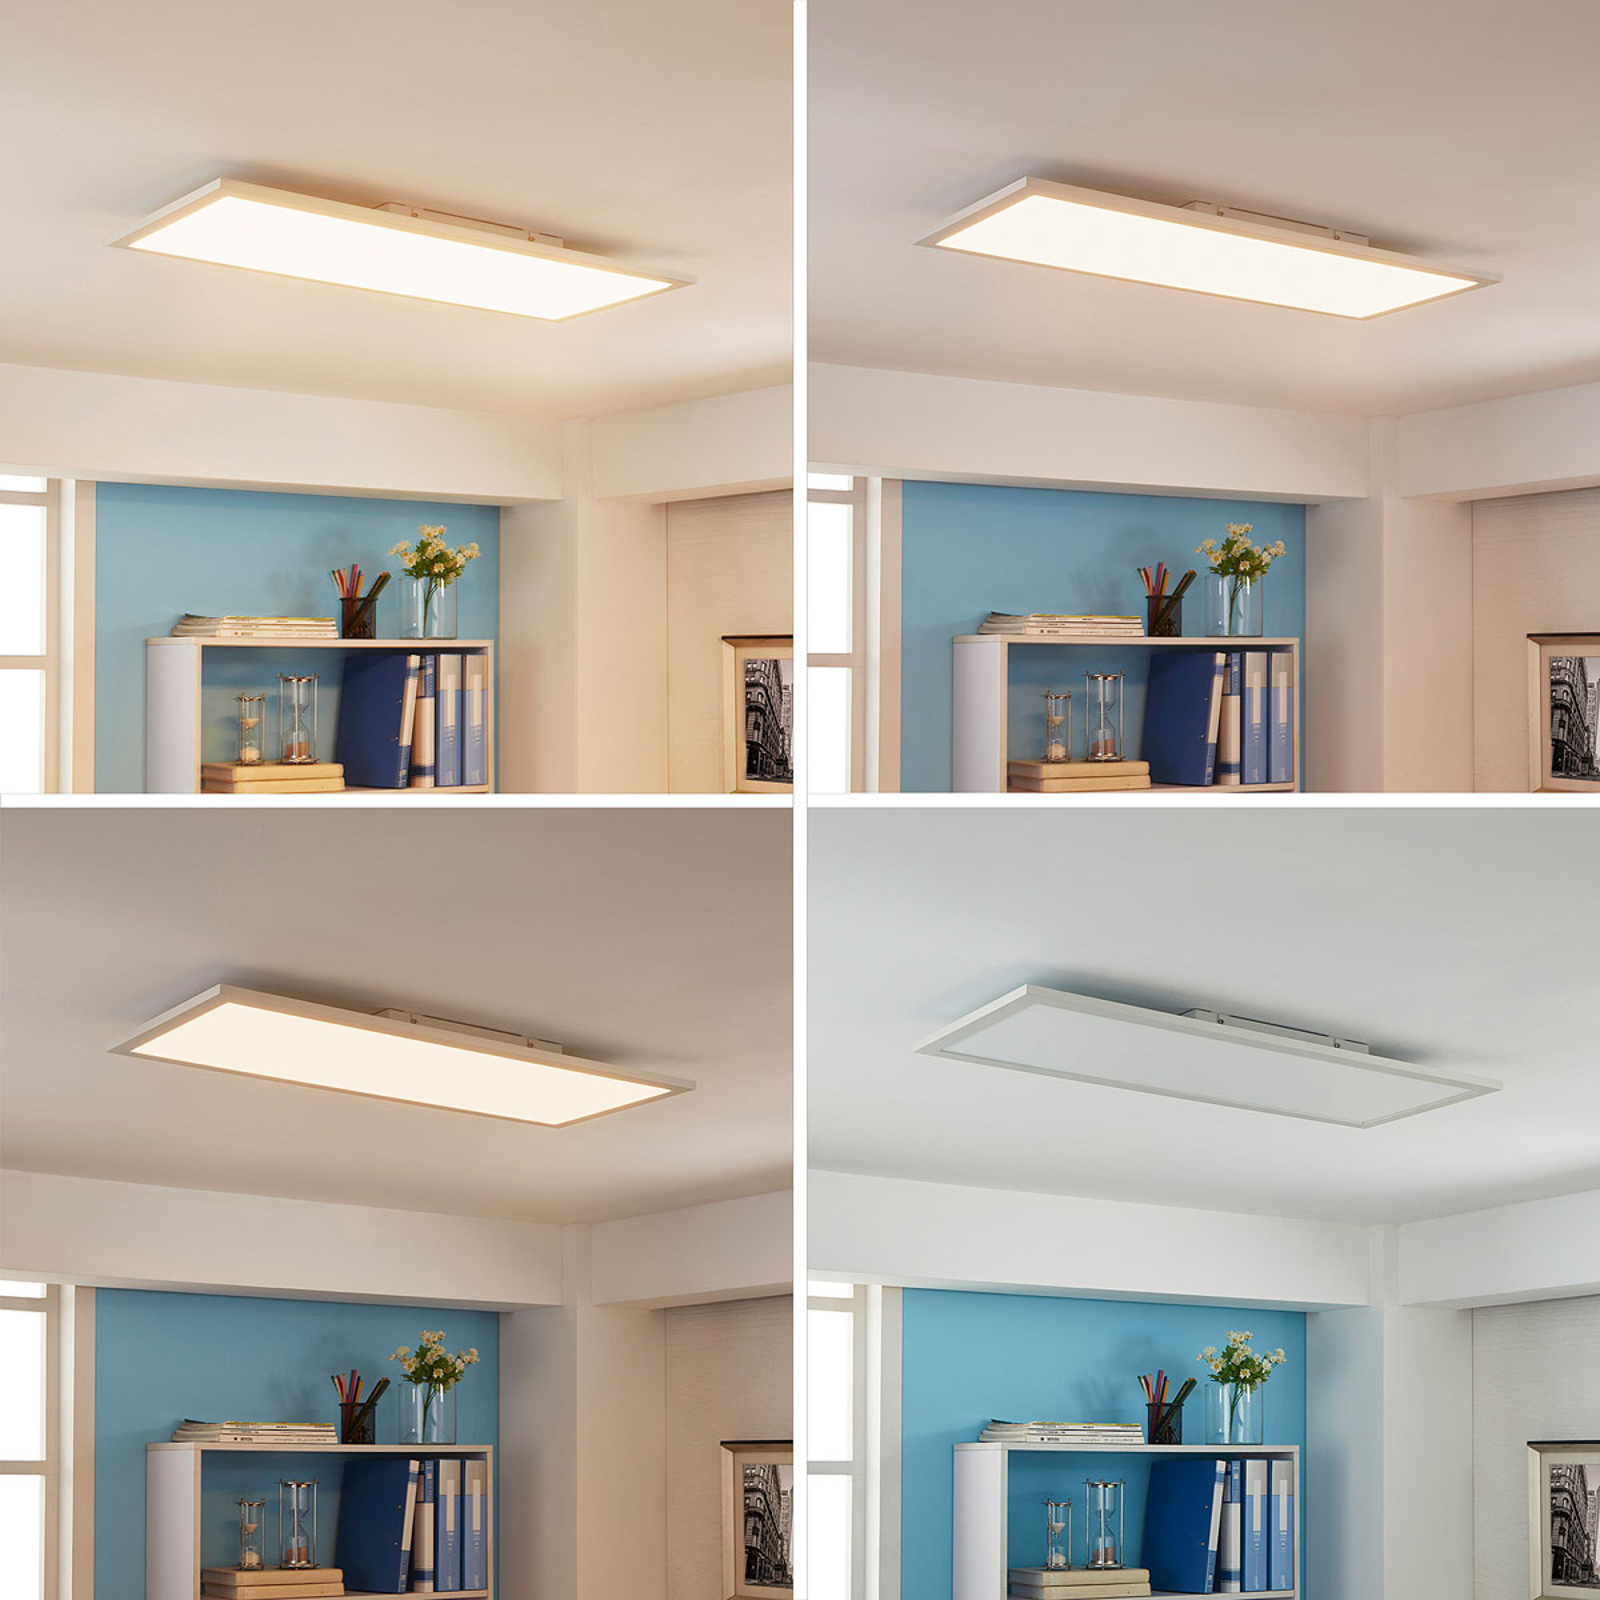 Längliches LED-Panel Enja, 30 x 80 cm